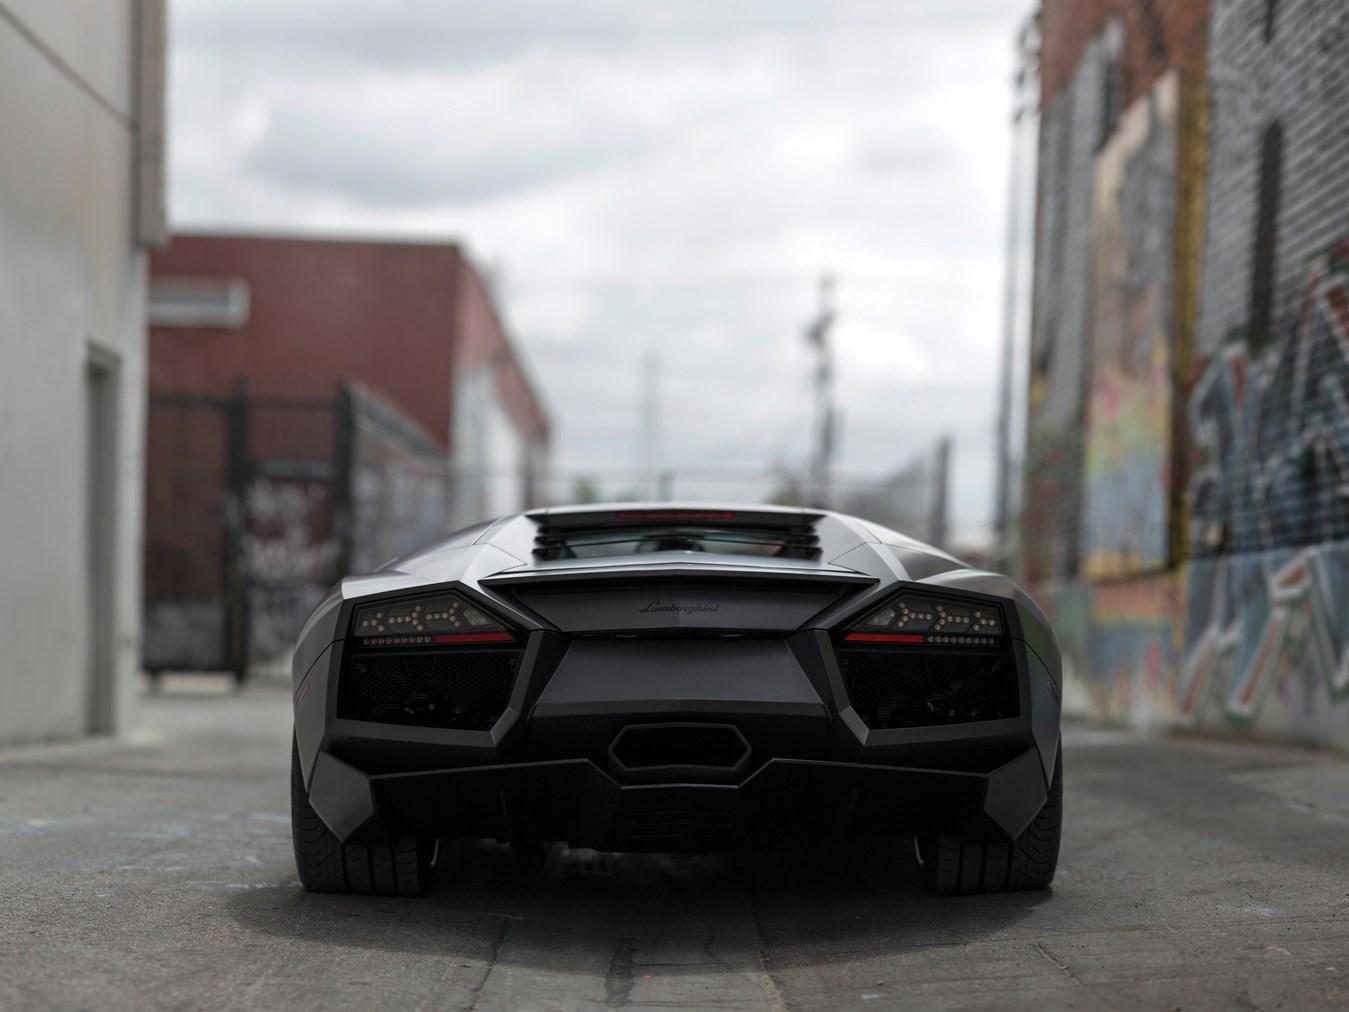 Beau 2008 Lamborghini Reventón